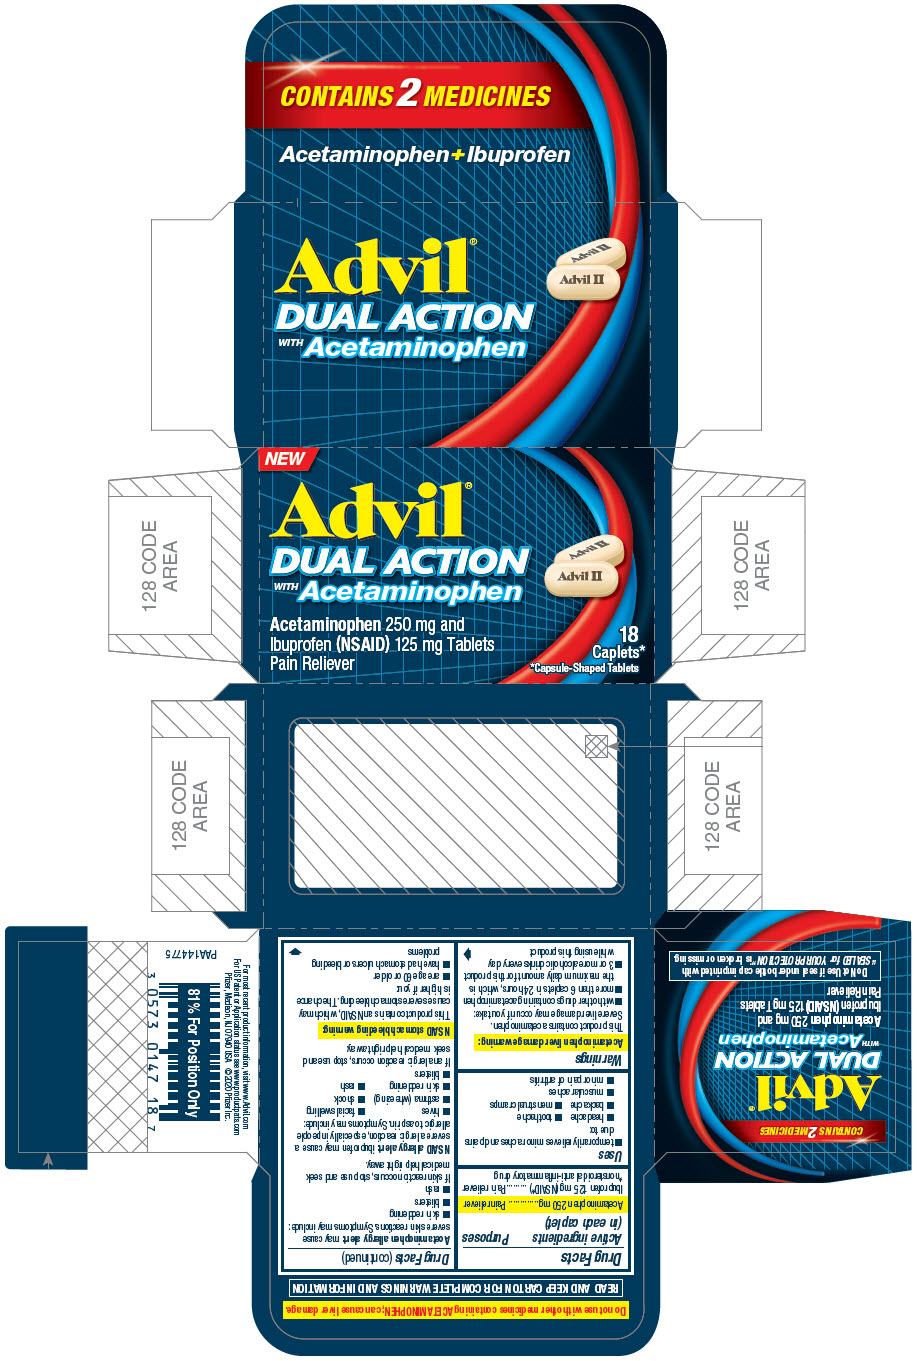 PRINCIPAL DISPLAY PANEL - 18 Caplet Bottle Carton